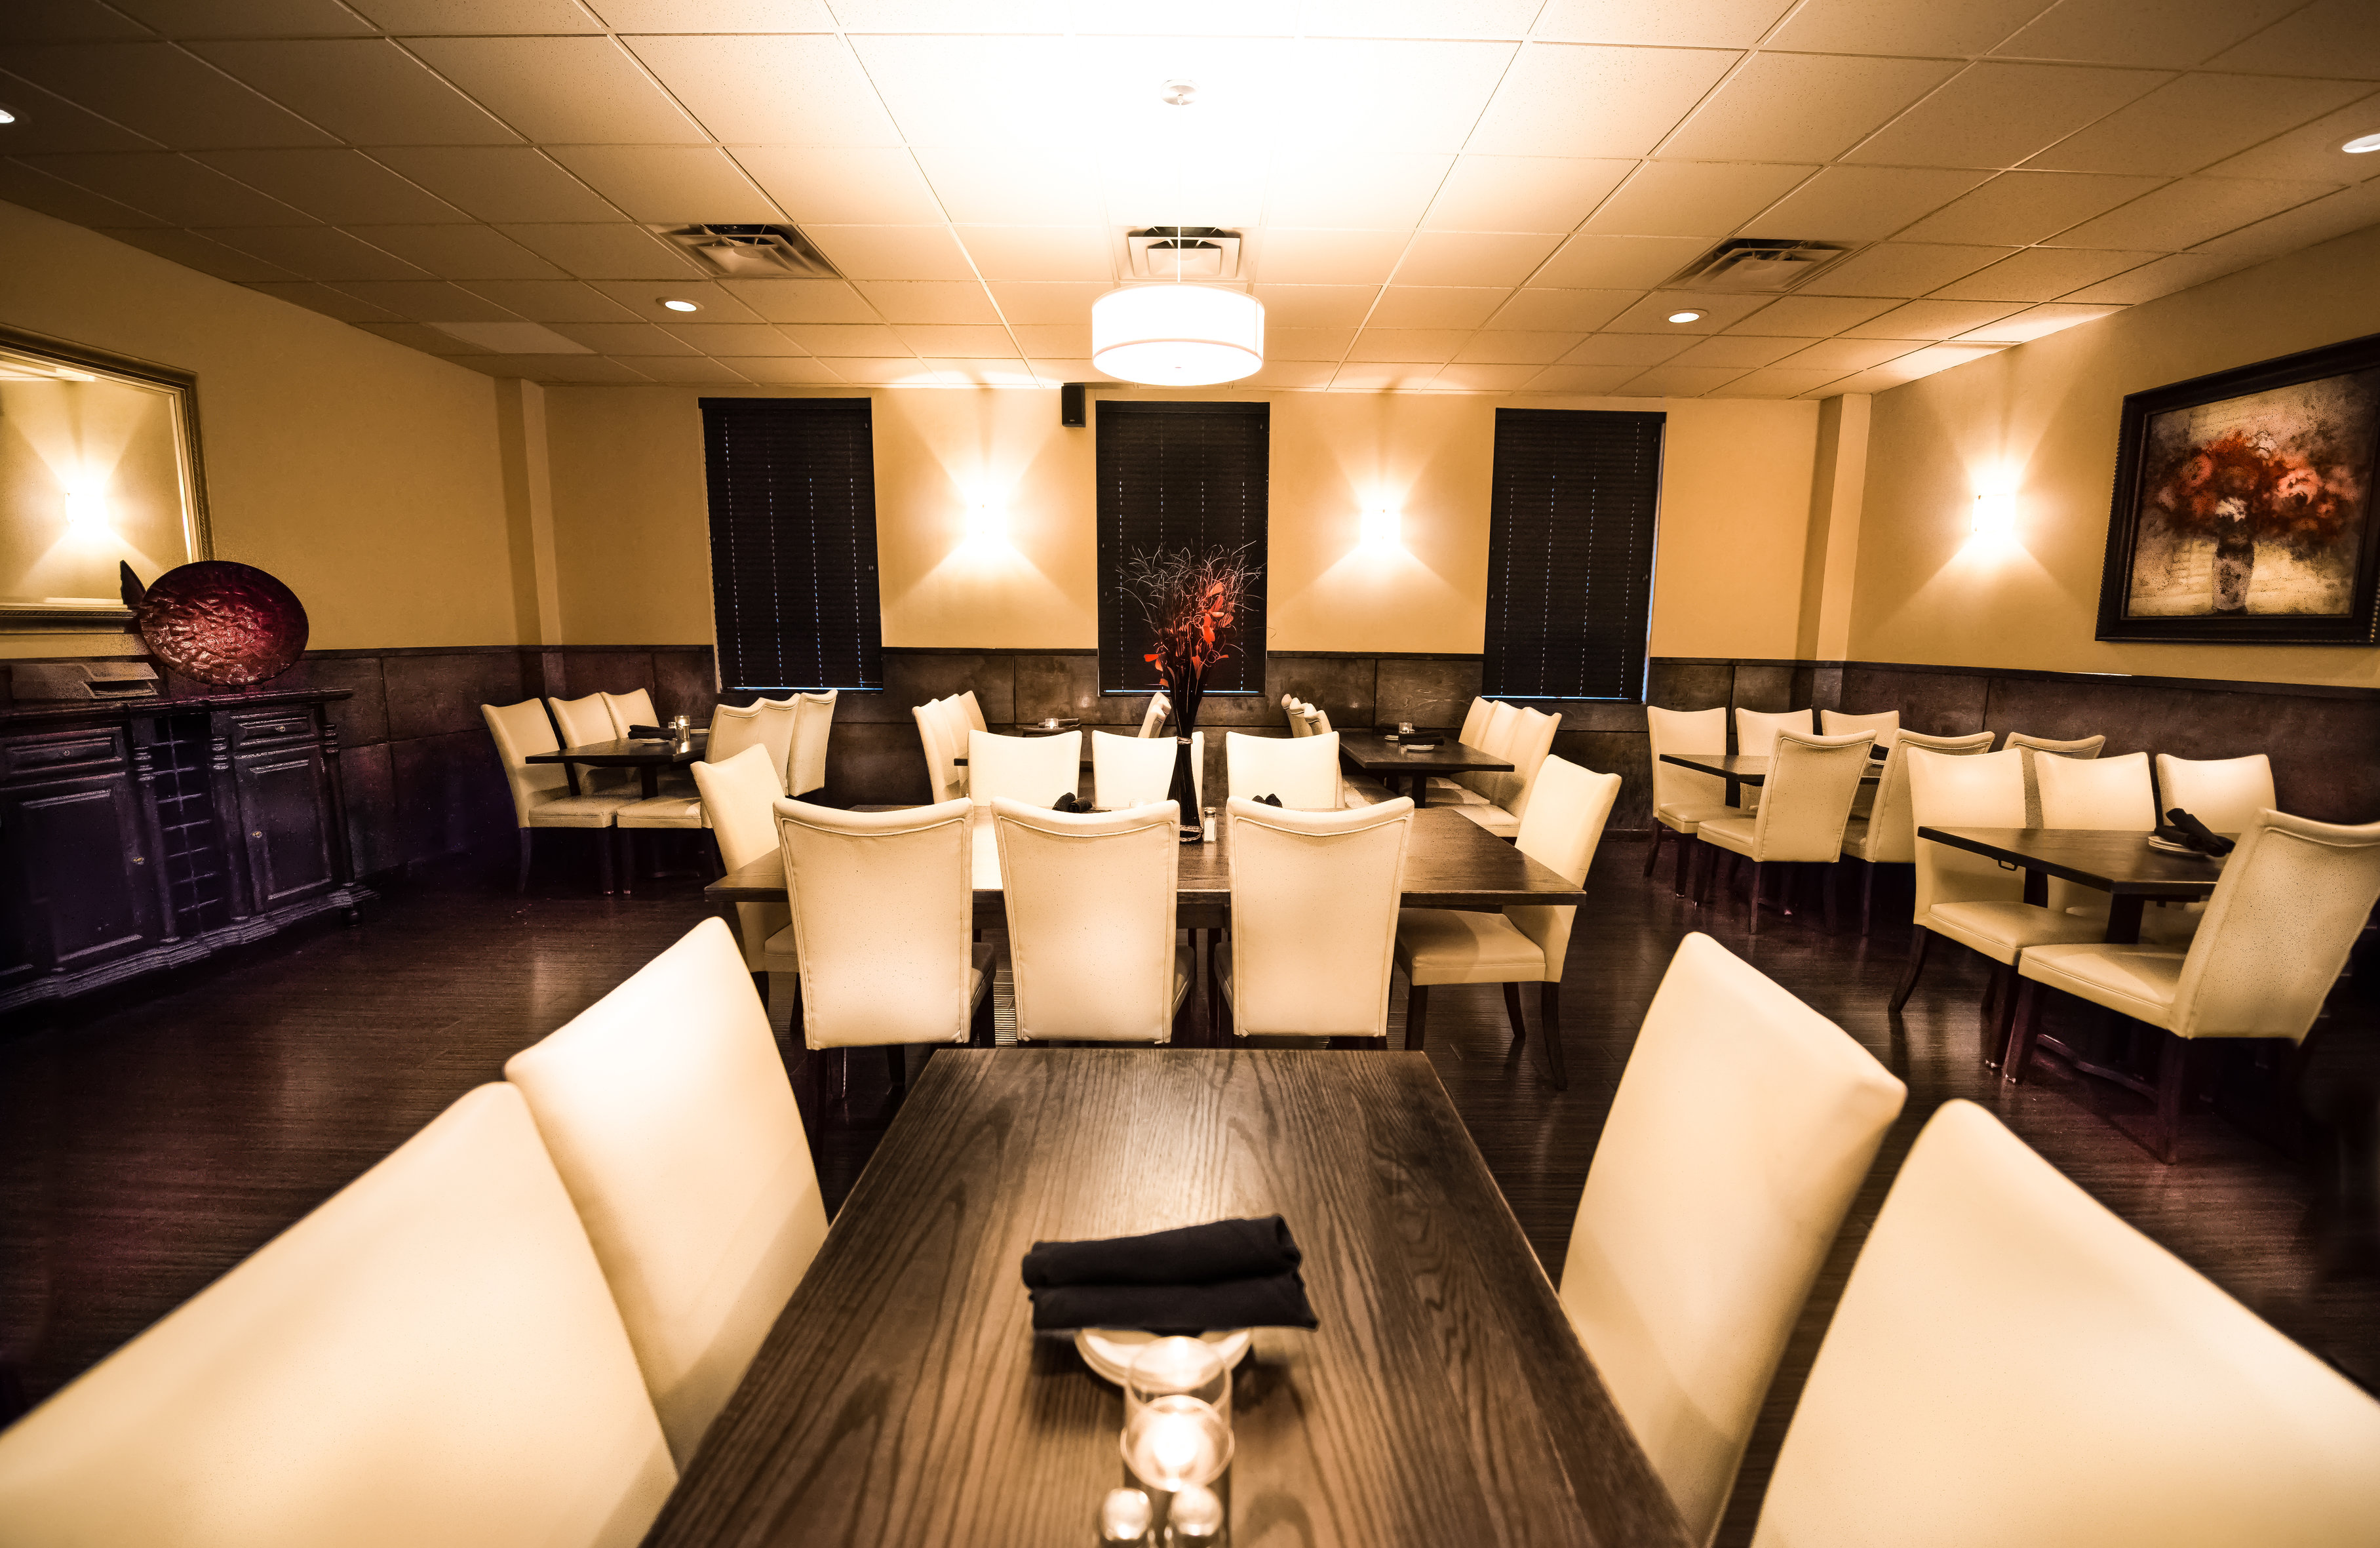 darfons-restaurant-banquet-room-3r